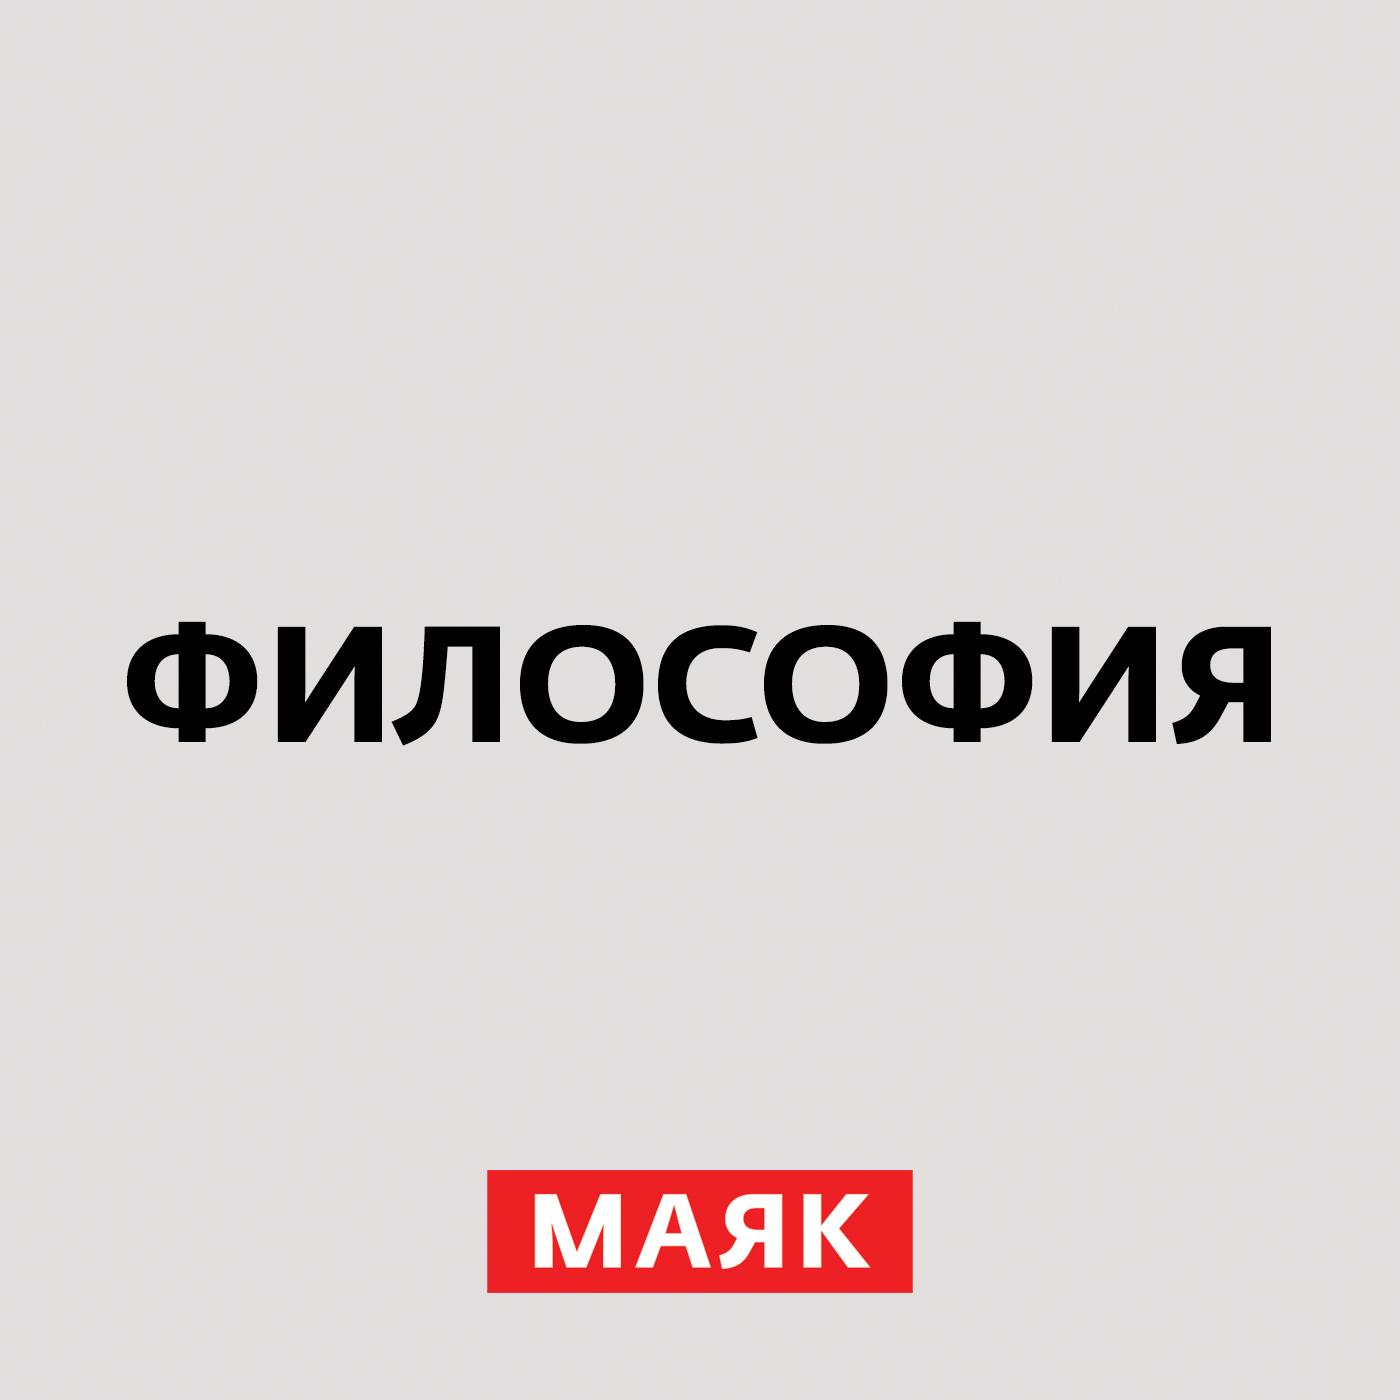 Творческий коллектив шоу «Объект 22» Лео Штраус и эзотеризм творческий коллектив шоу объект 22 лео штраус и эзотеризм